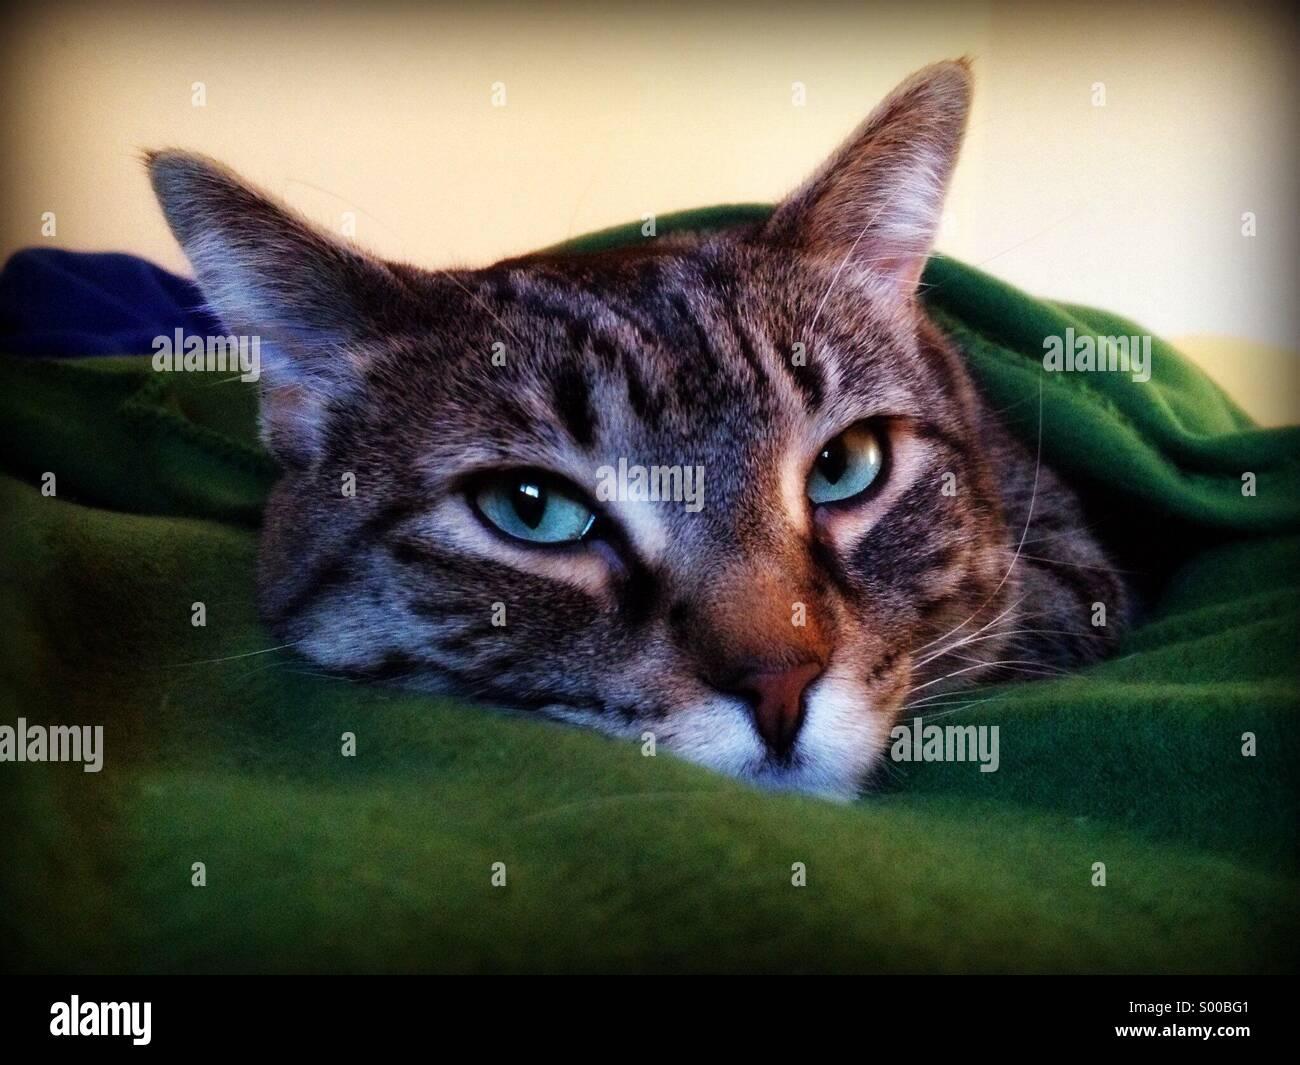 Sleepy Tabby Cat Stockfotos & Sleepy Tabby Cat Bilder - Seite 13 - Alamy